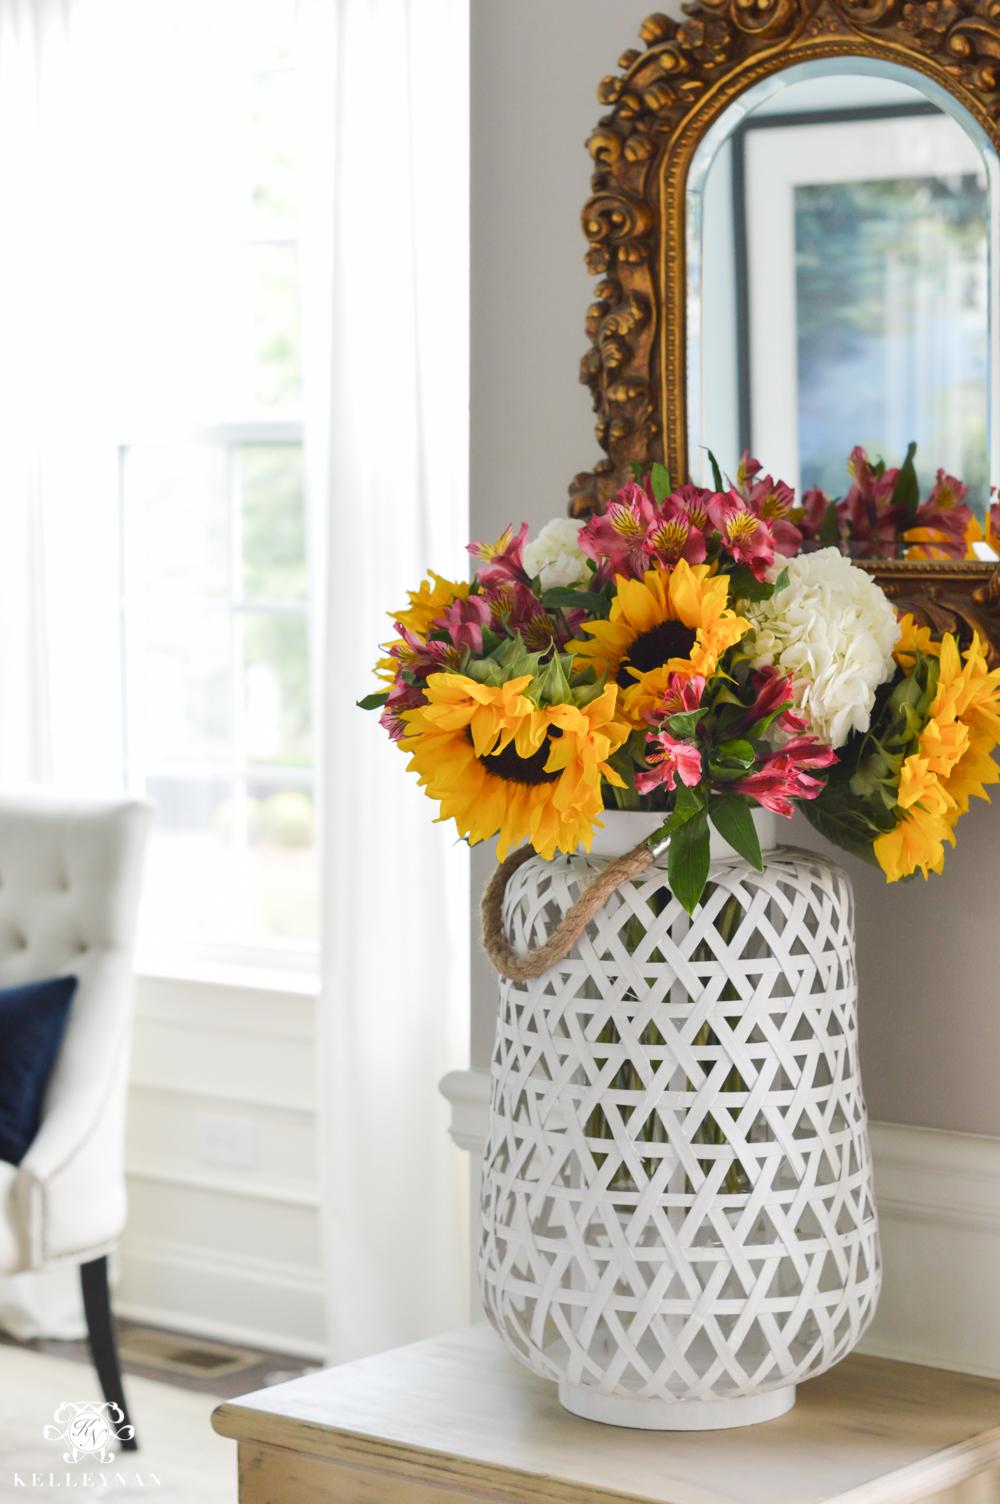 Floral Arrangement Ideas Using Lanterns - Kelley Nan